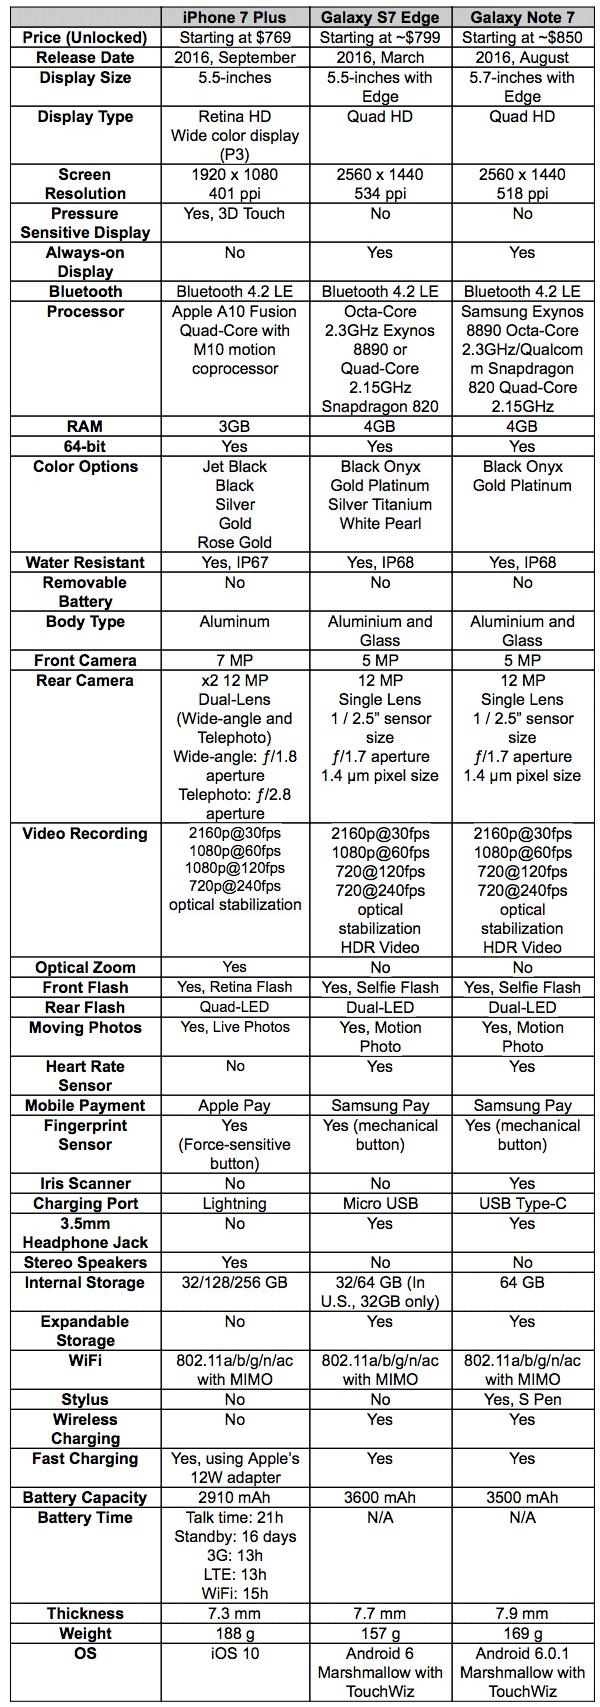 iPhone 7 Plus vs Galaxy S7 vs Galaxy Note 7